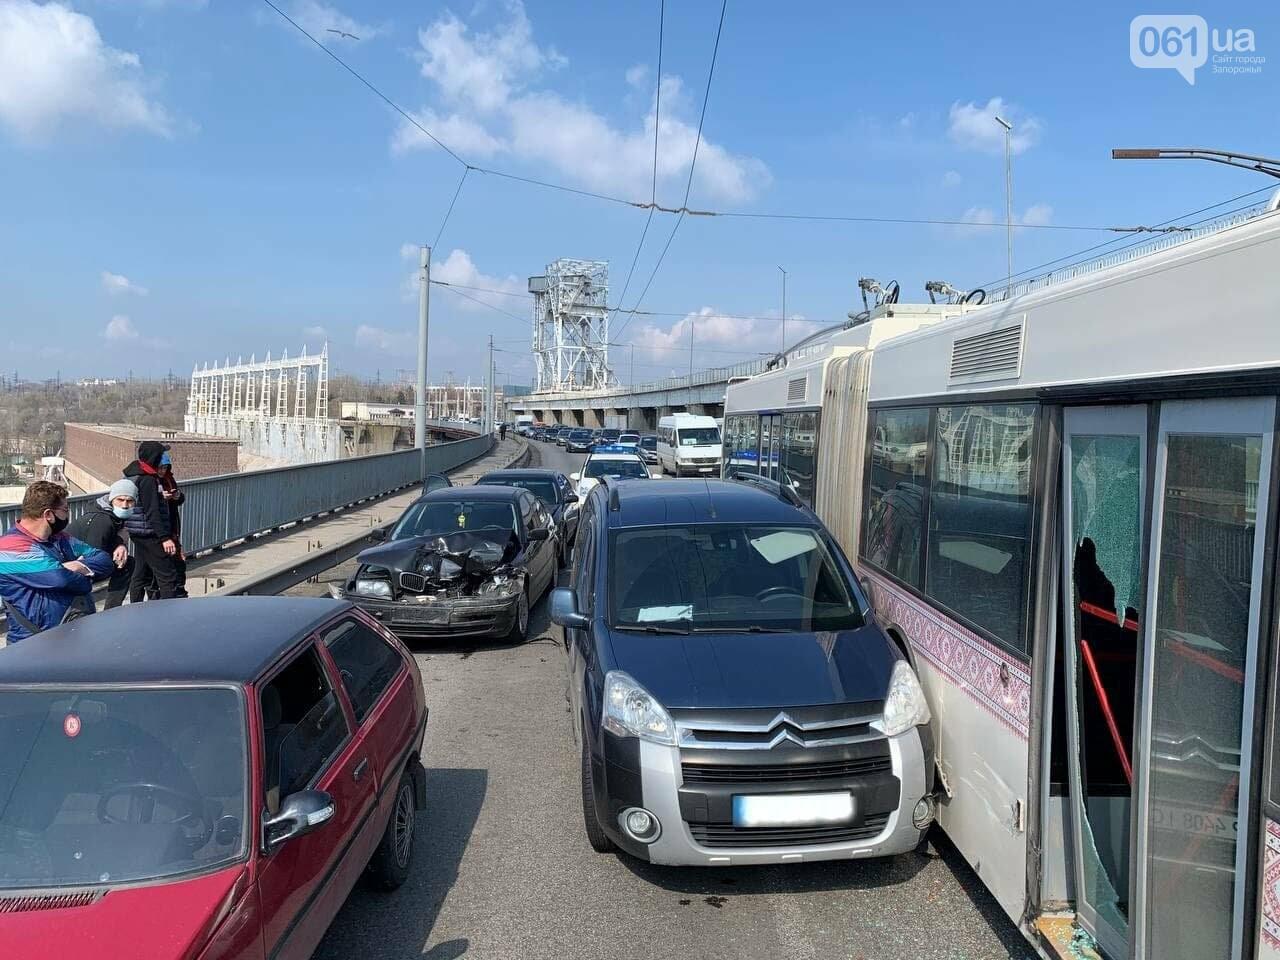 В Запорожье на плотине ДнепроГЭС в аварию попал троллейбус и три легковушки, фото-2